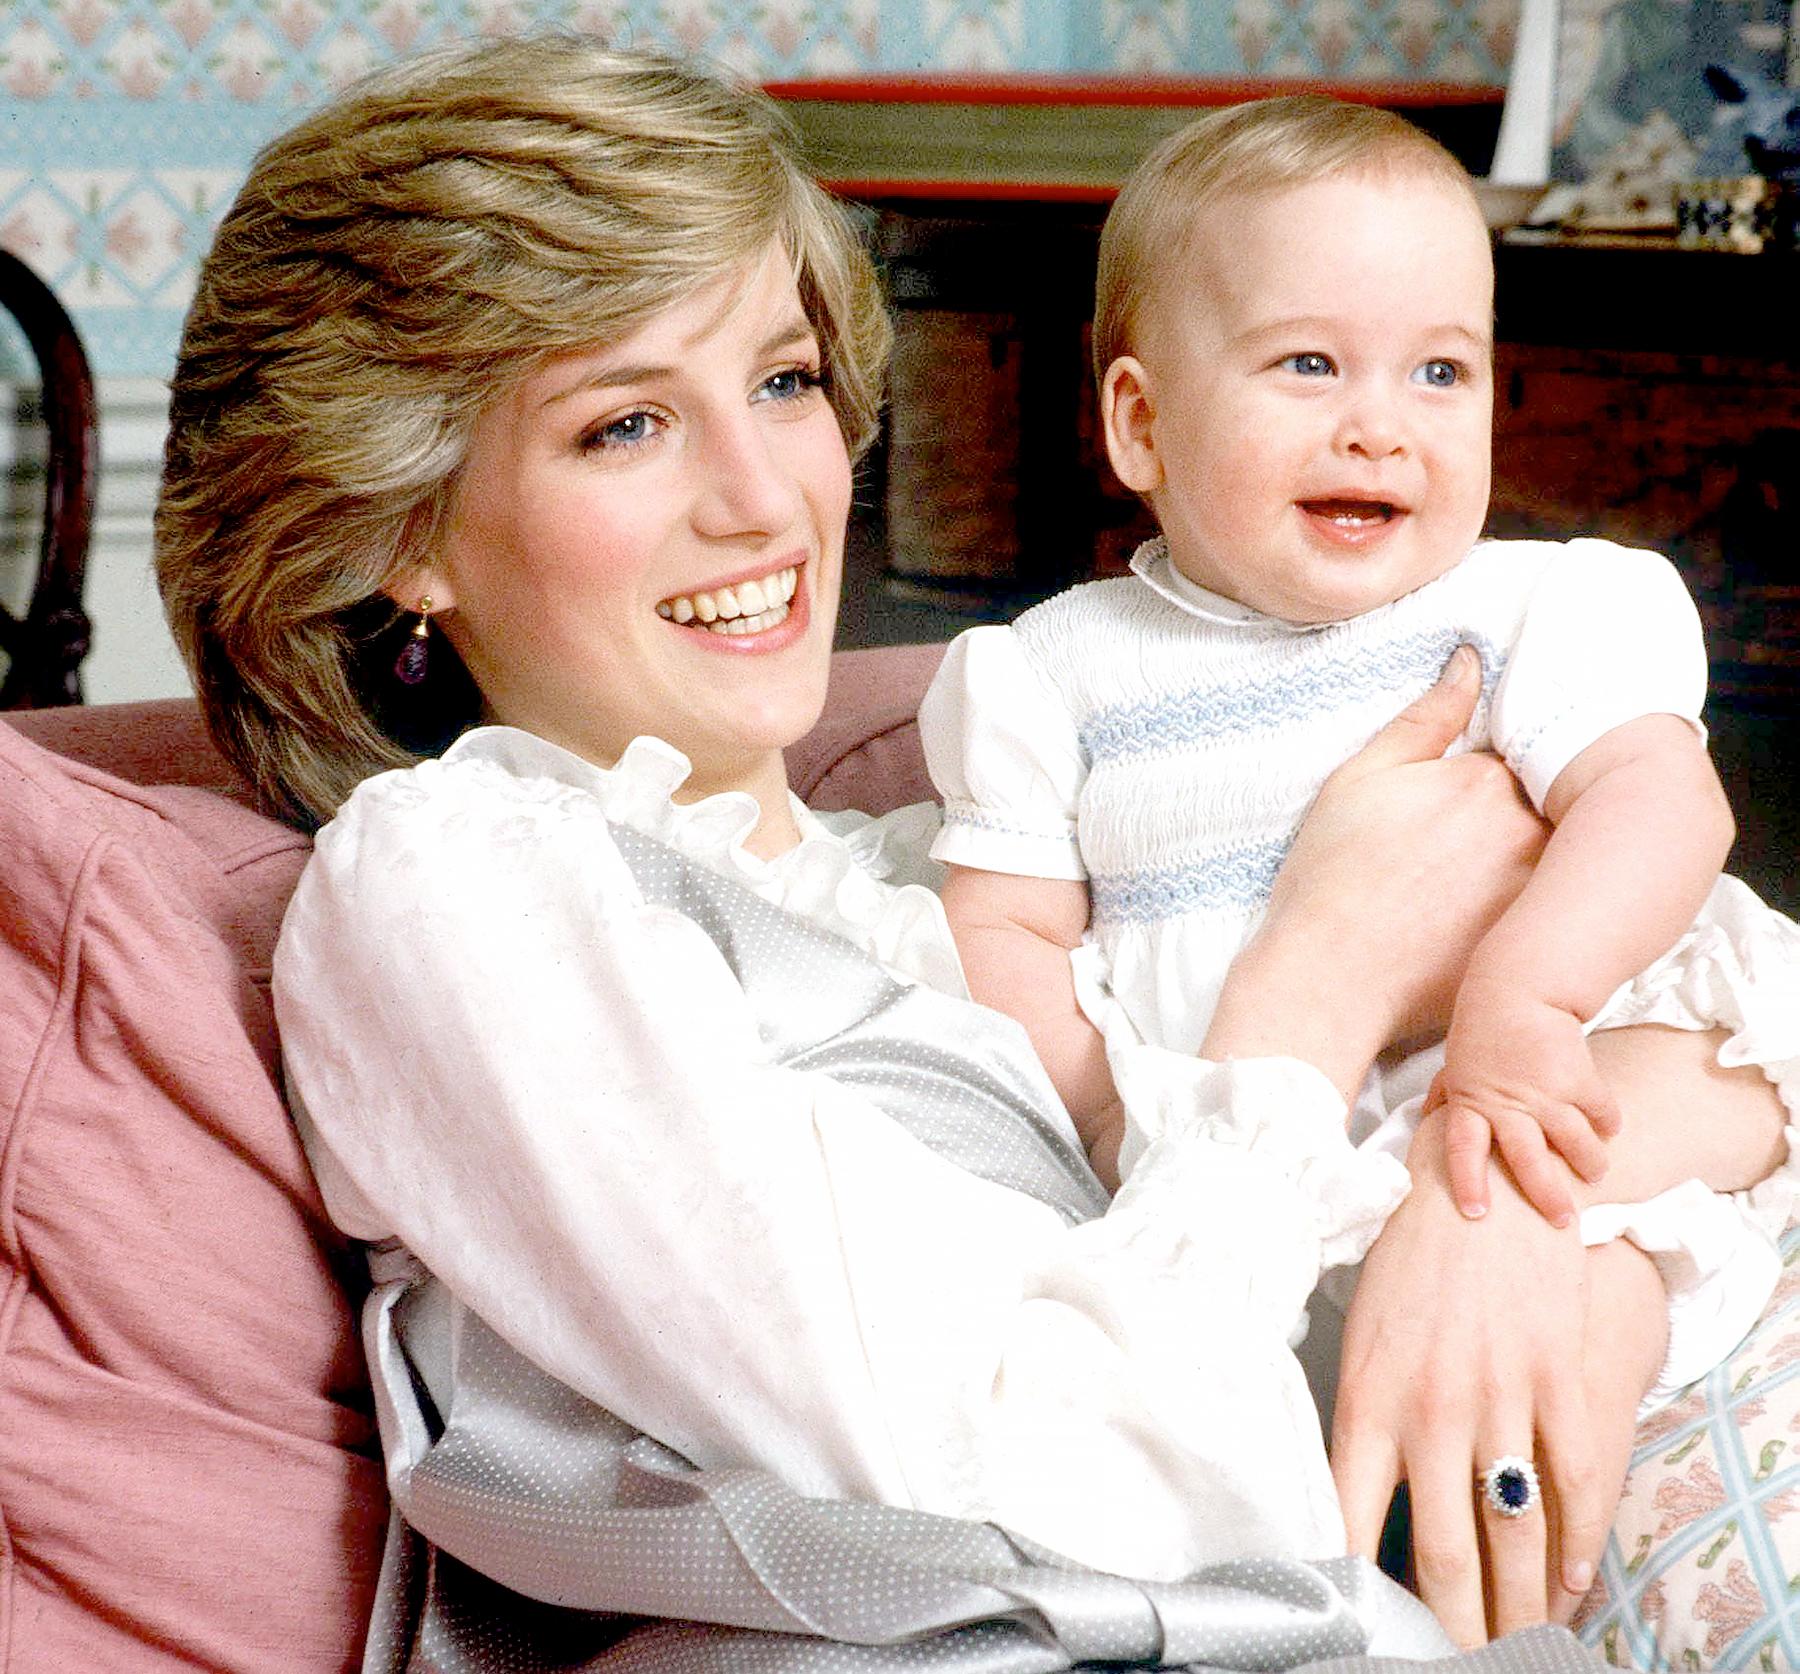 Princess Diana with her son, Prince William, at Kensington Palace.